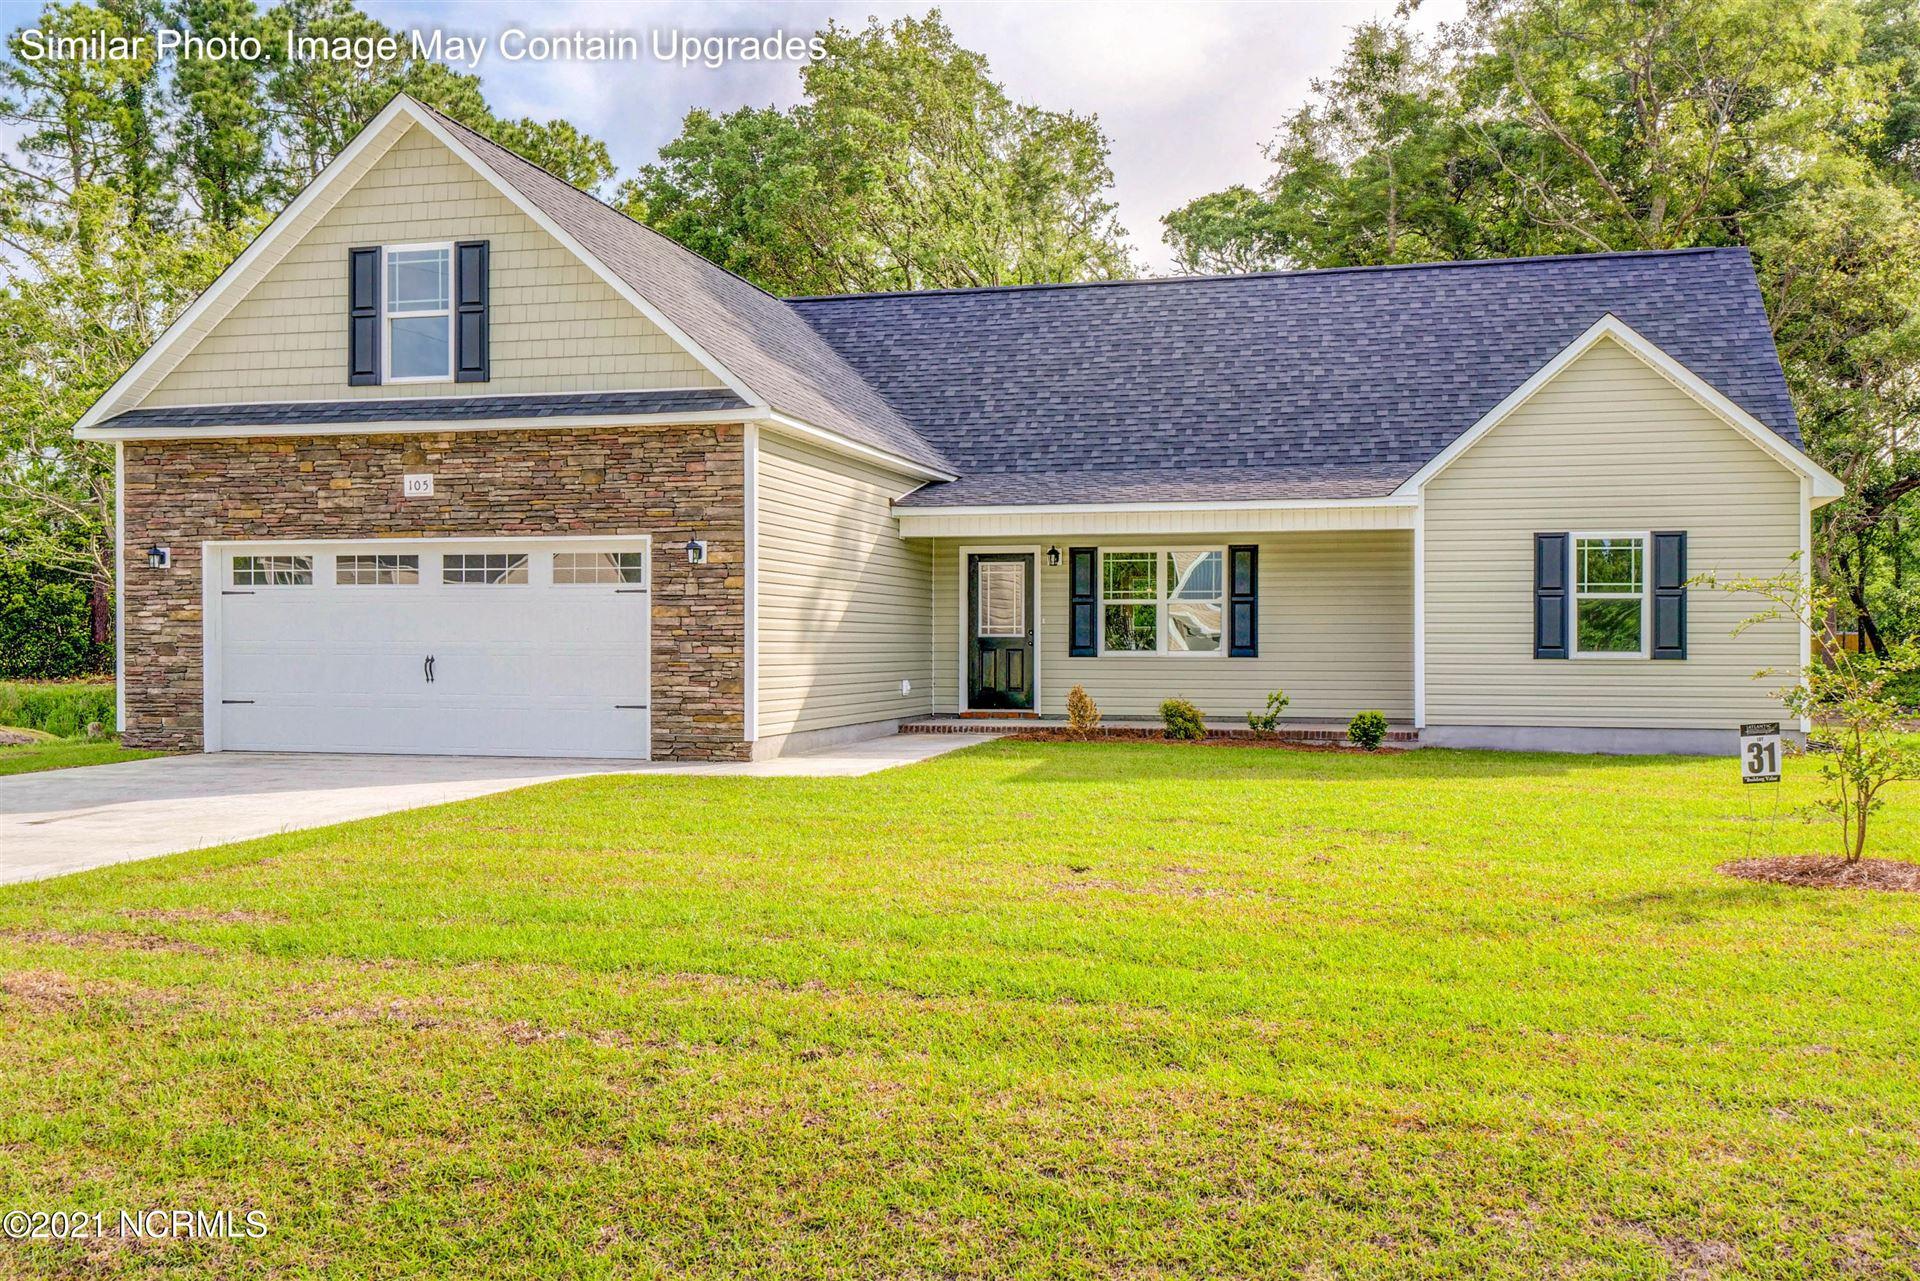 Photo of 606 Noah Court, Jacksonville, NC 28540 (MLS # 100262100)